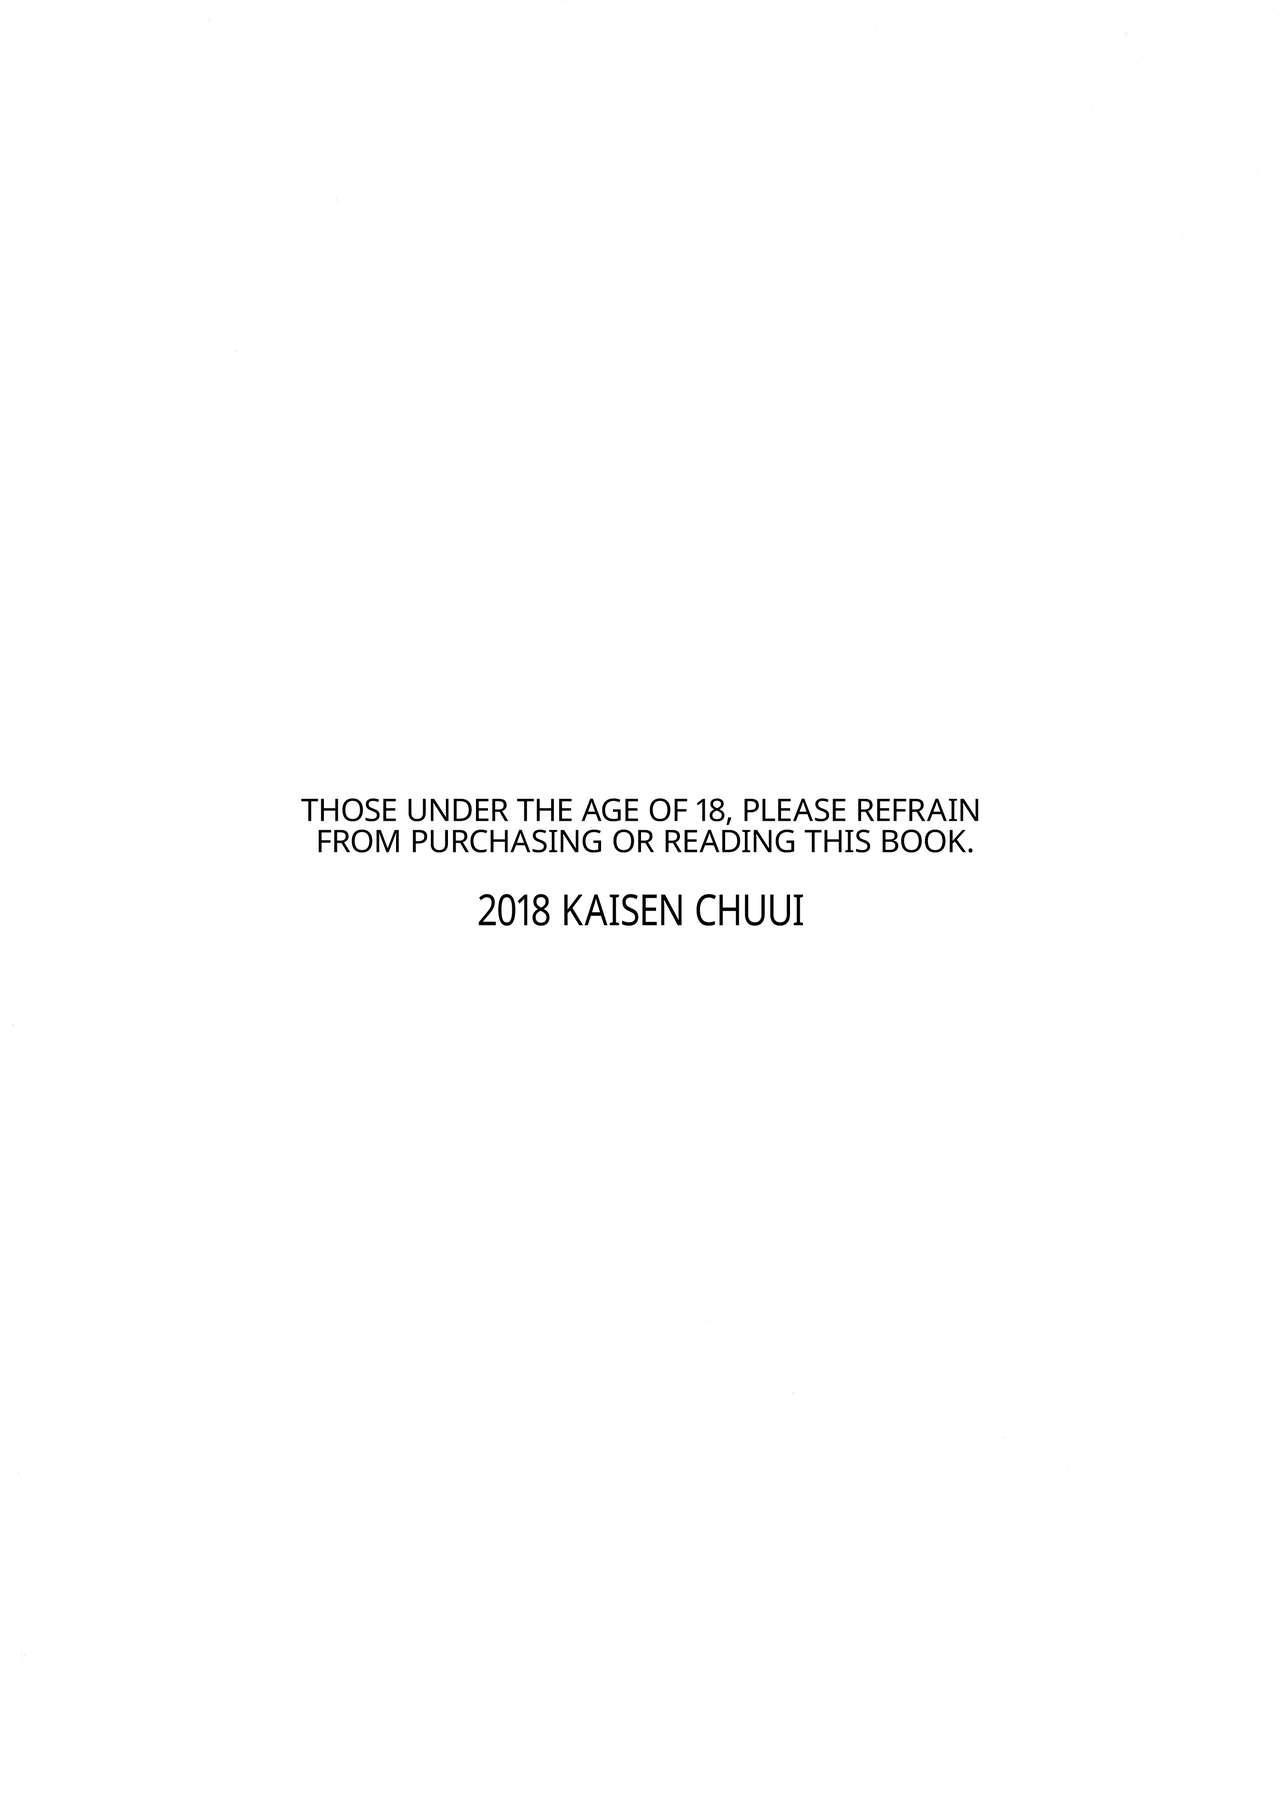 (C95) [Atsuya Kougyou (Kaisen Chuui)] Shinjin Teitoku Tokubetsu Shori Tantoukan Kyoudou Gakari Kashima-san | New Admiral Special Treatment Education Instructor Ship Kashima-san (Kantai Collection -KanColle-) [English] [RedLantern] 22